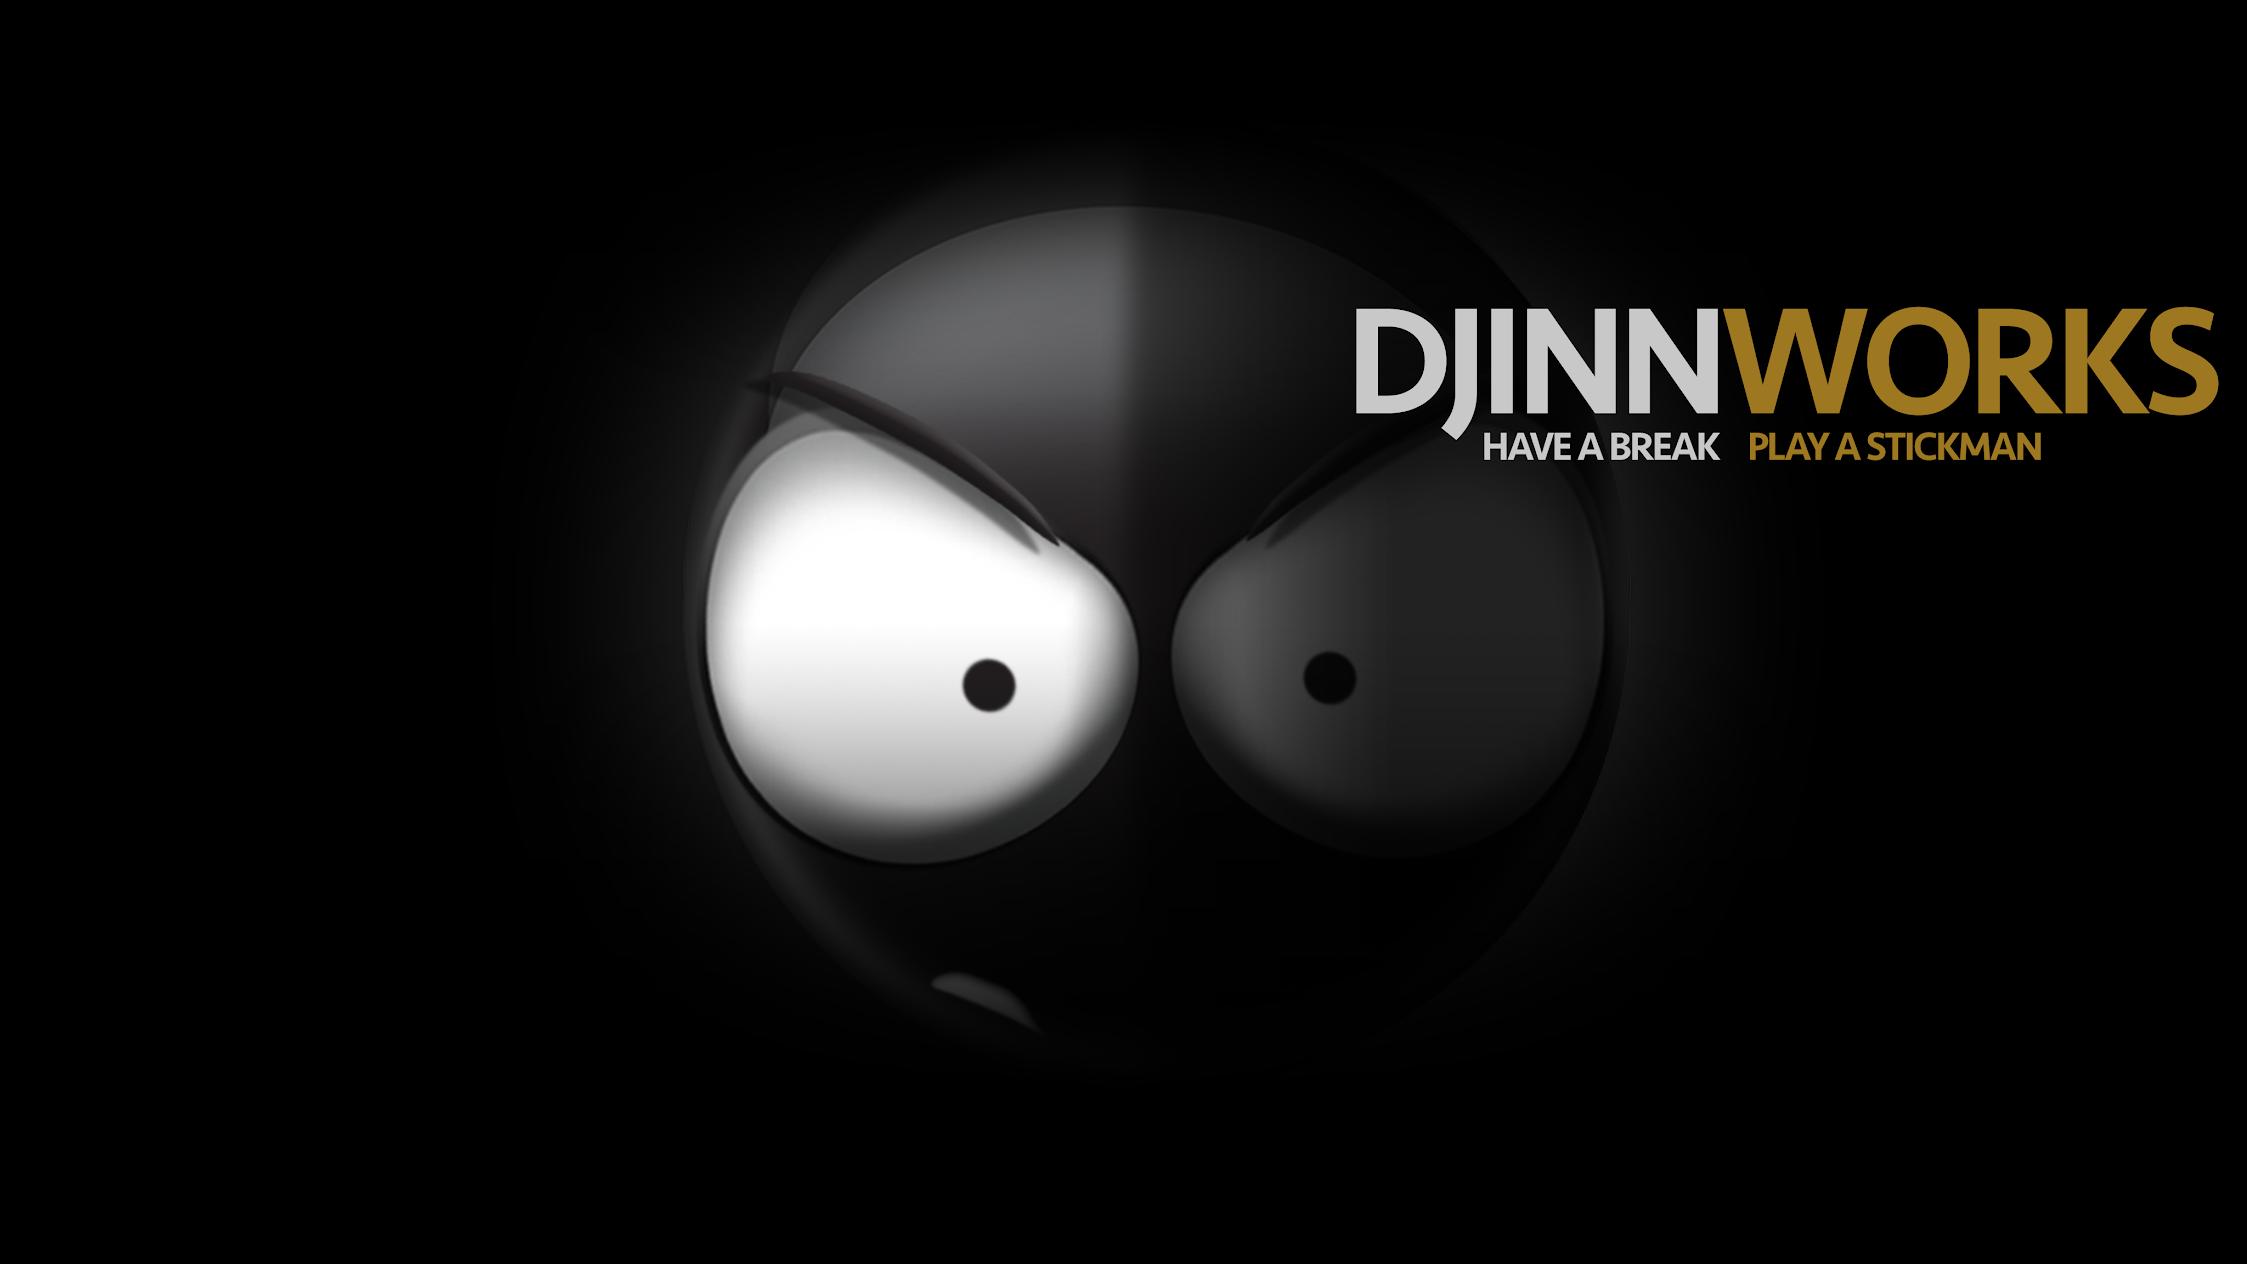 Djinnworks GmbH